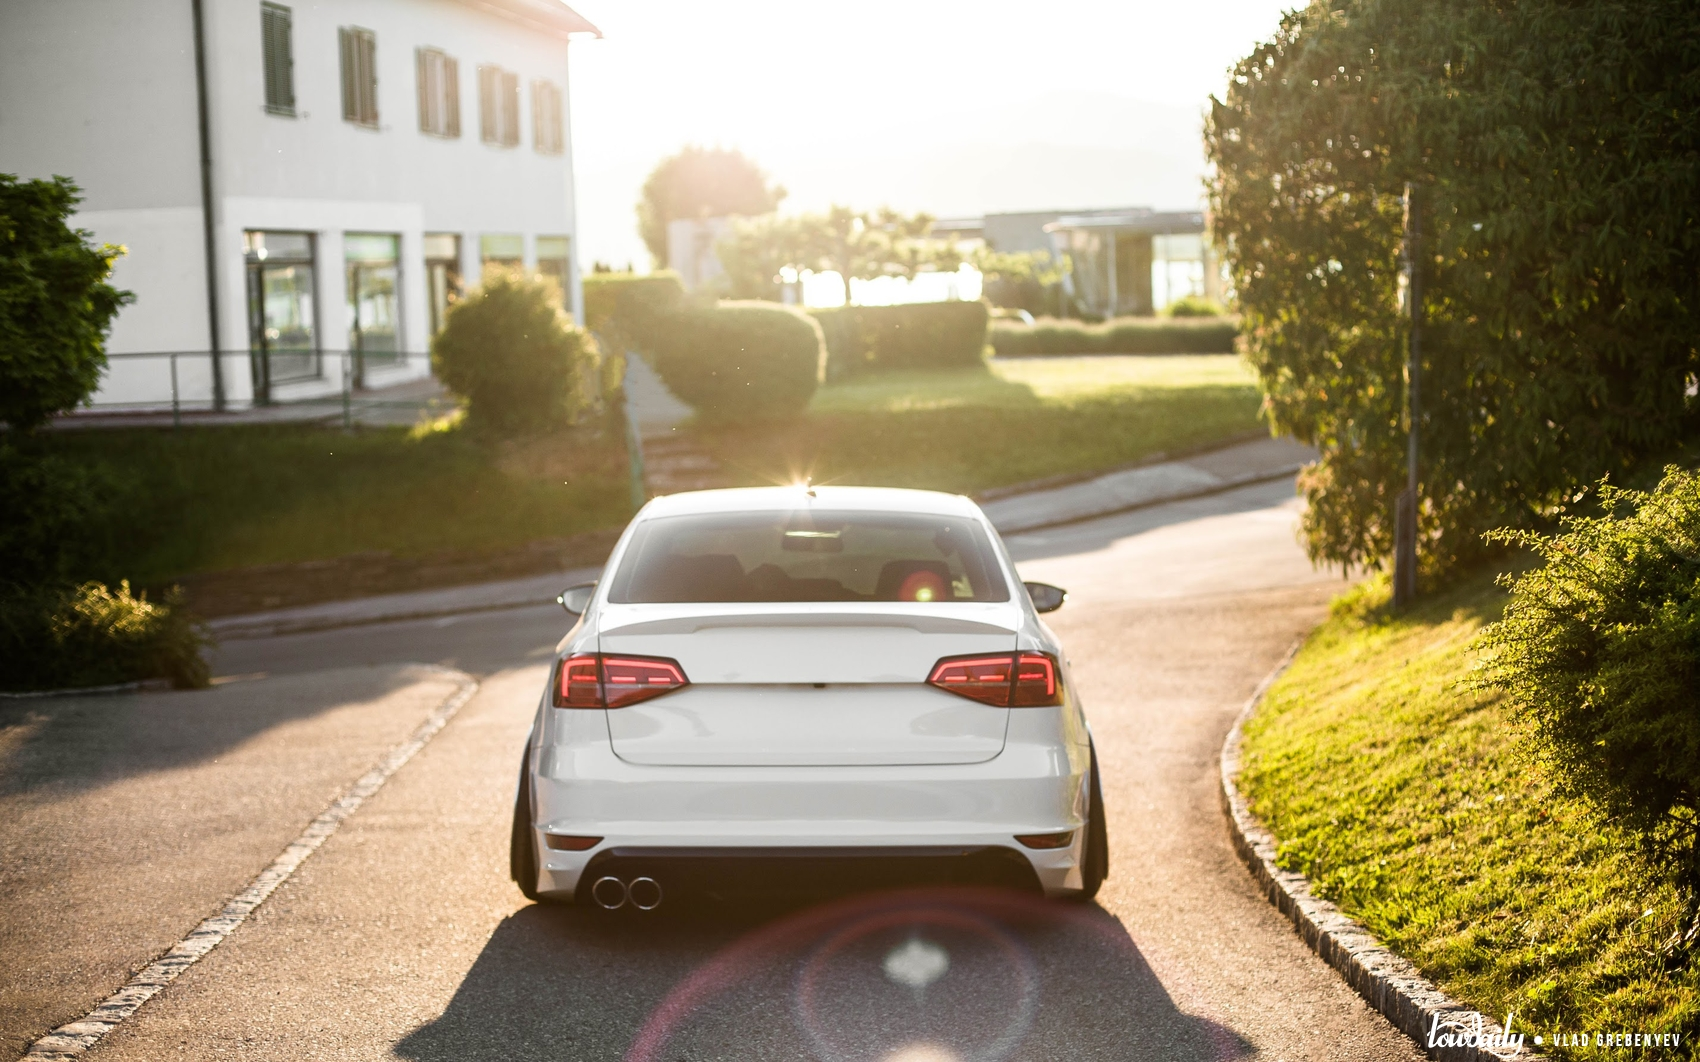 Volkswagen Jetta - Nothing Extra Worthersee